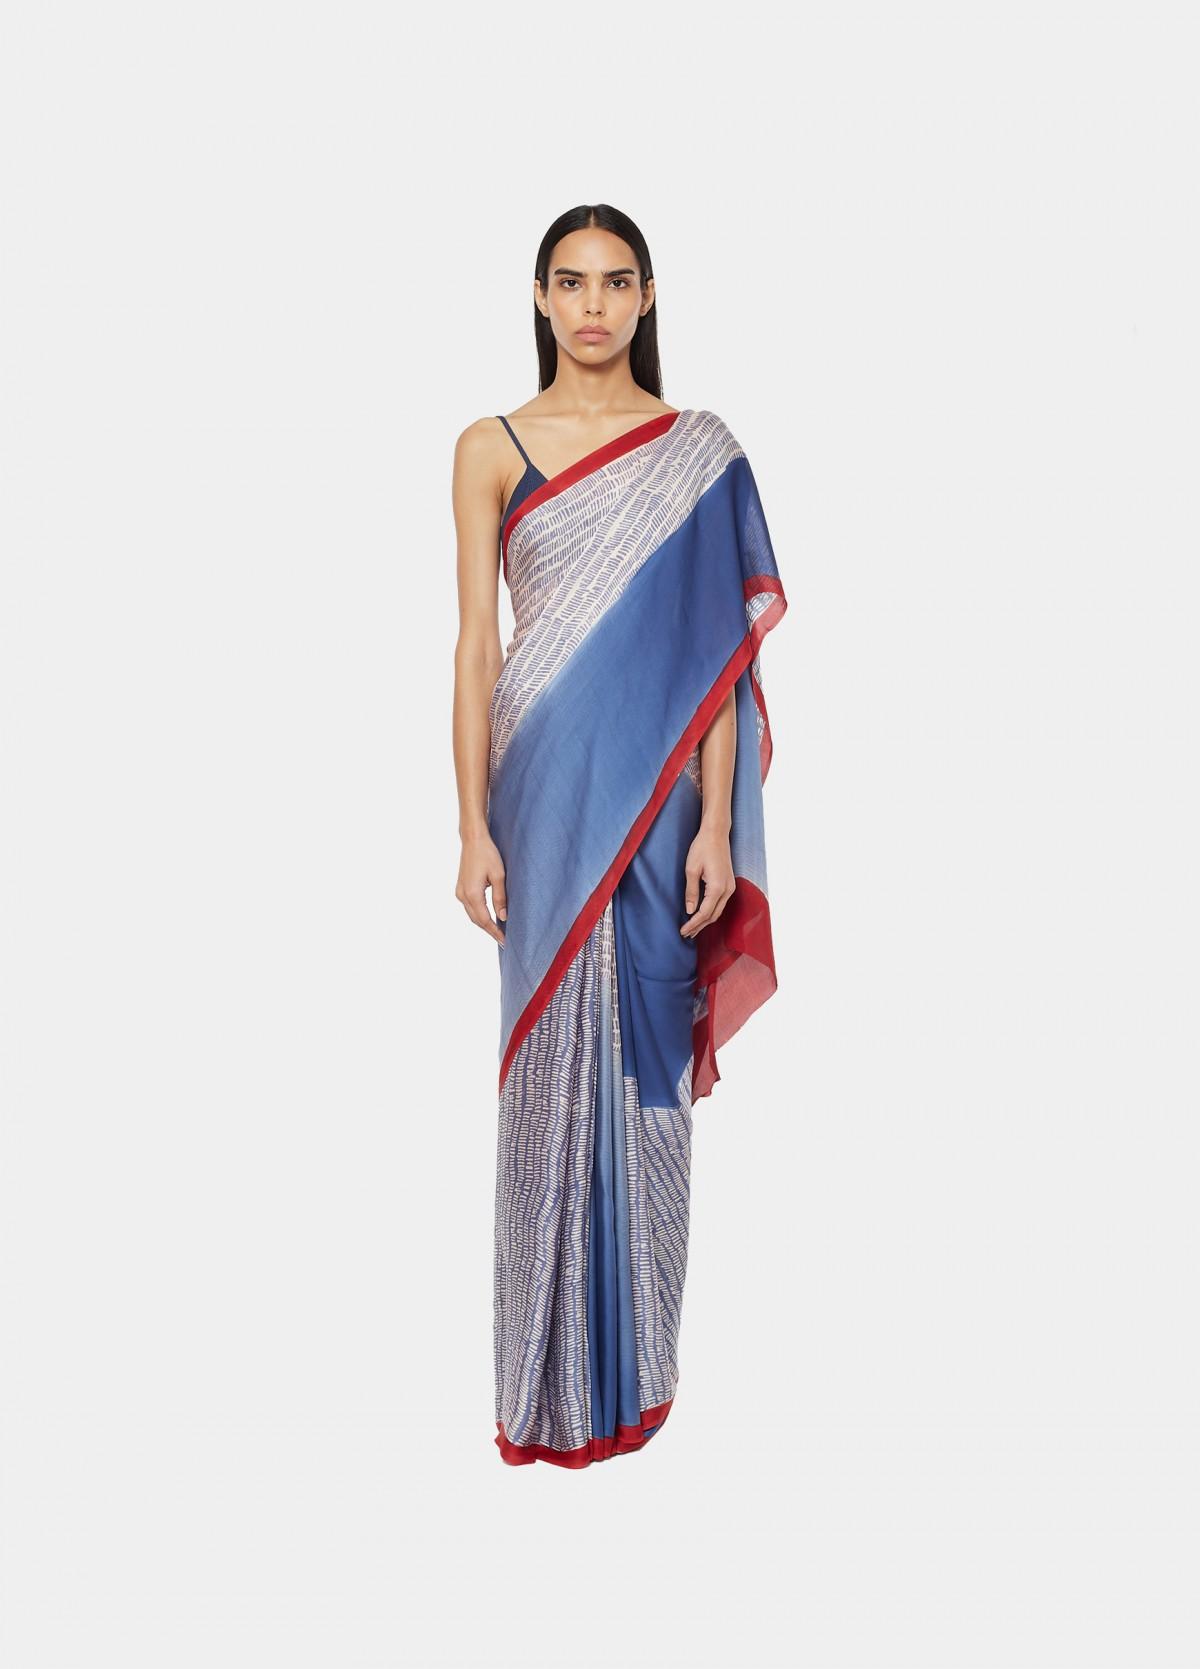 The Kangura Sari